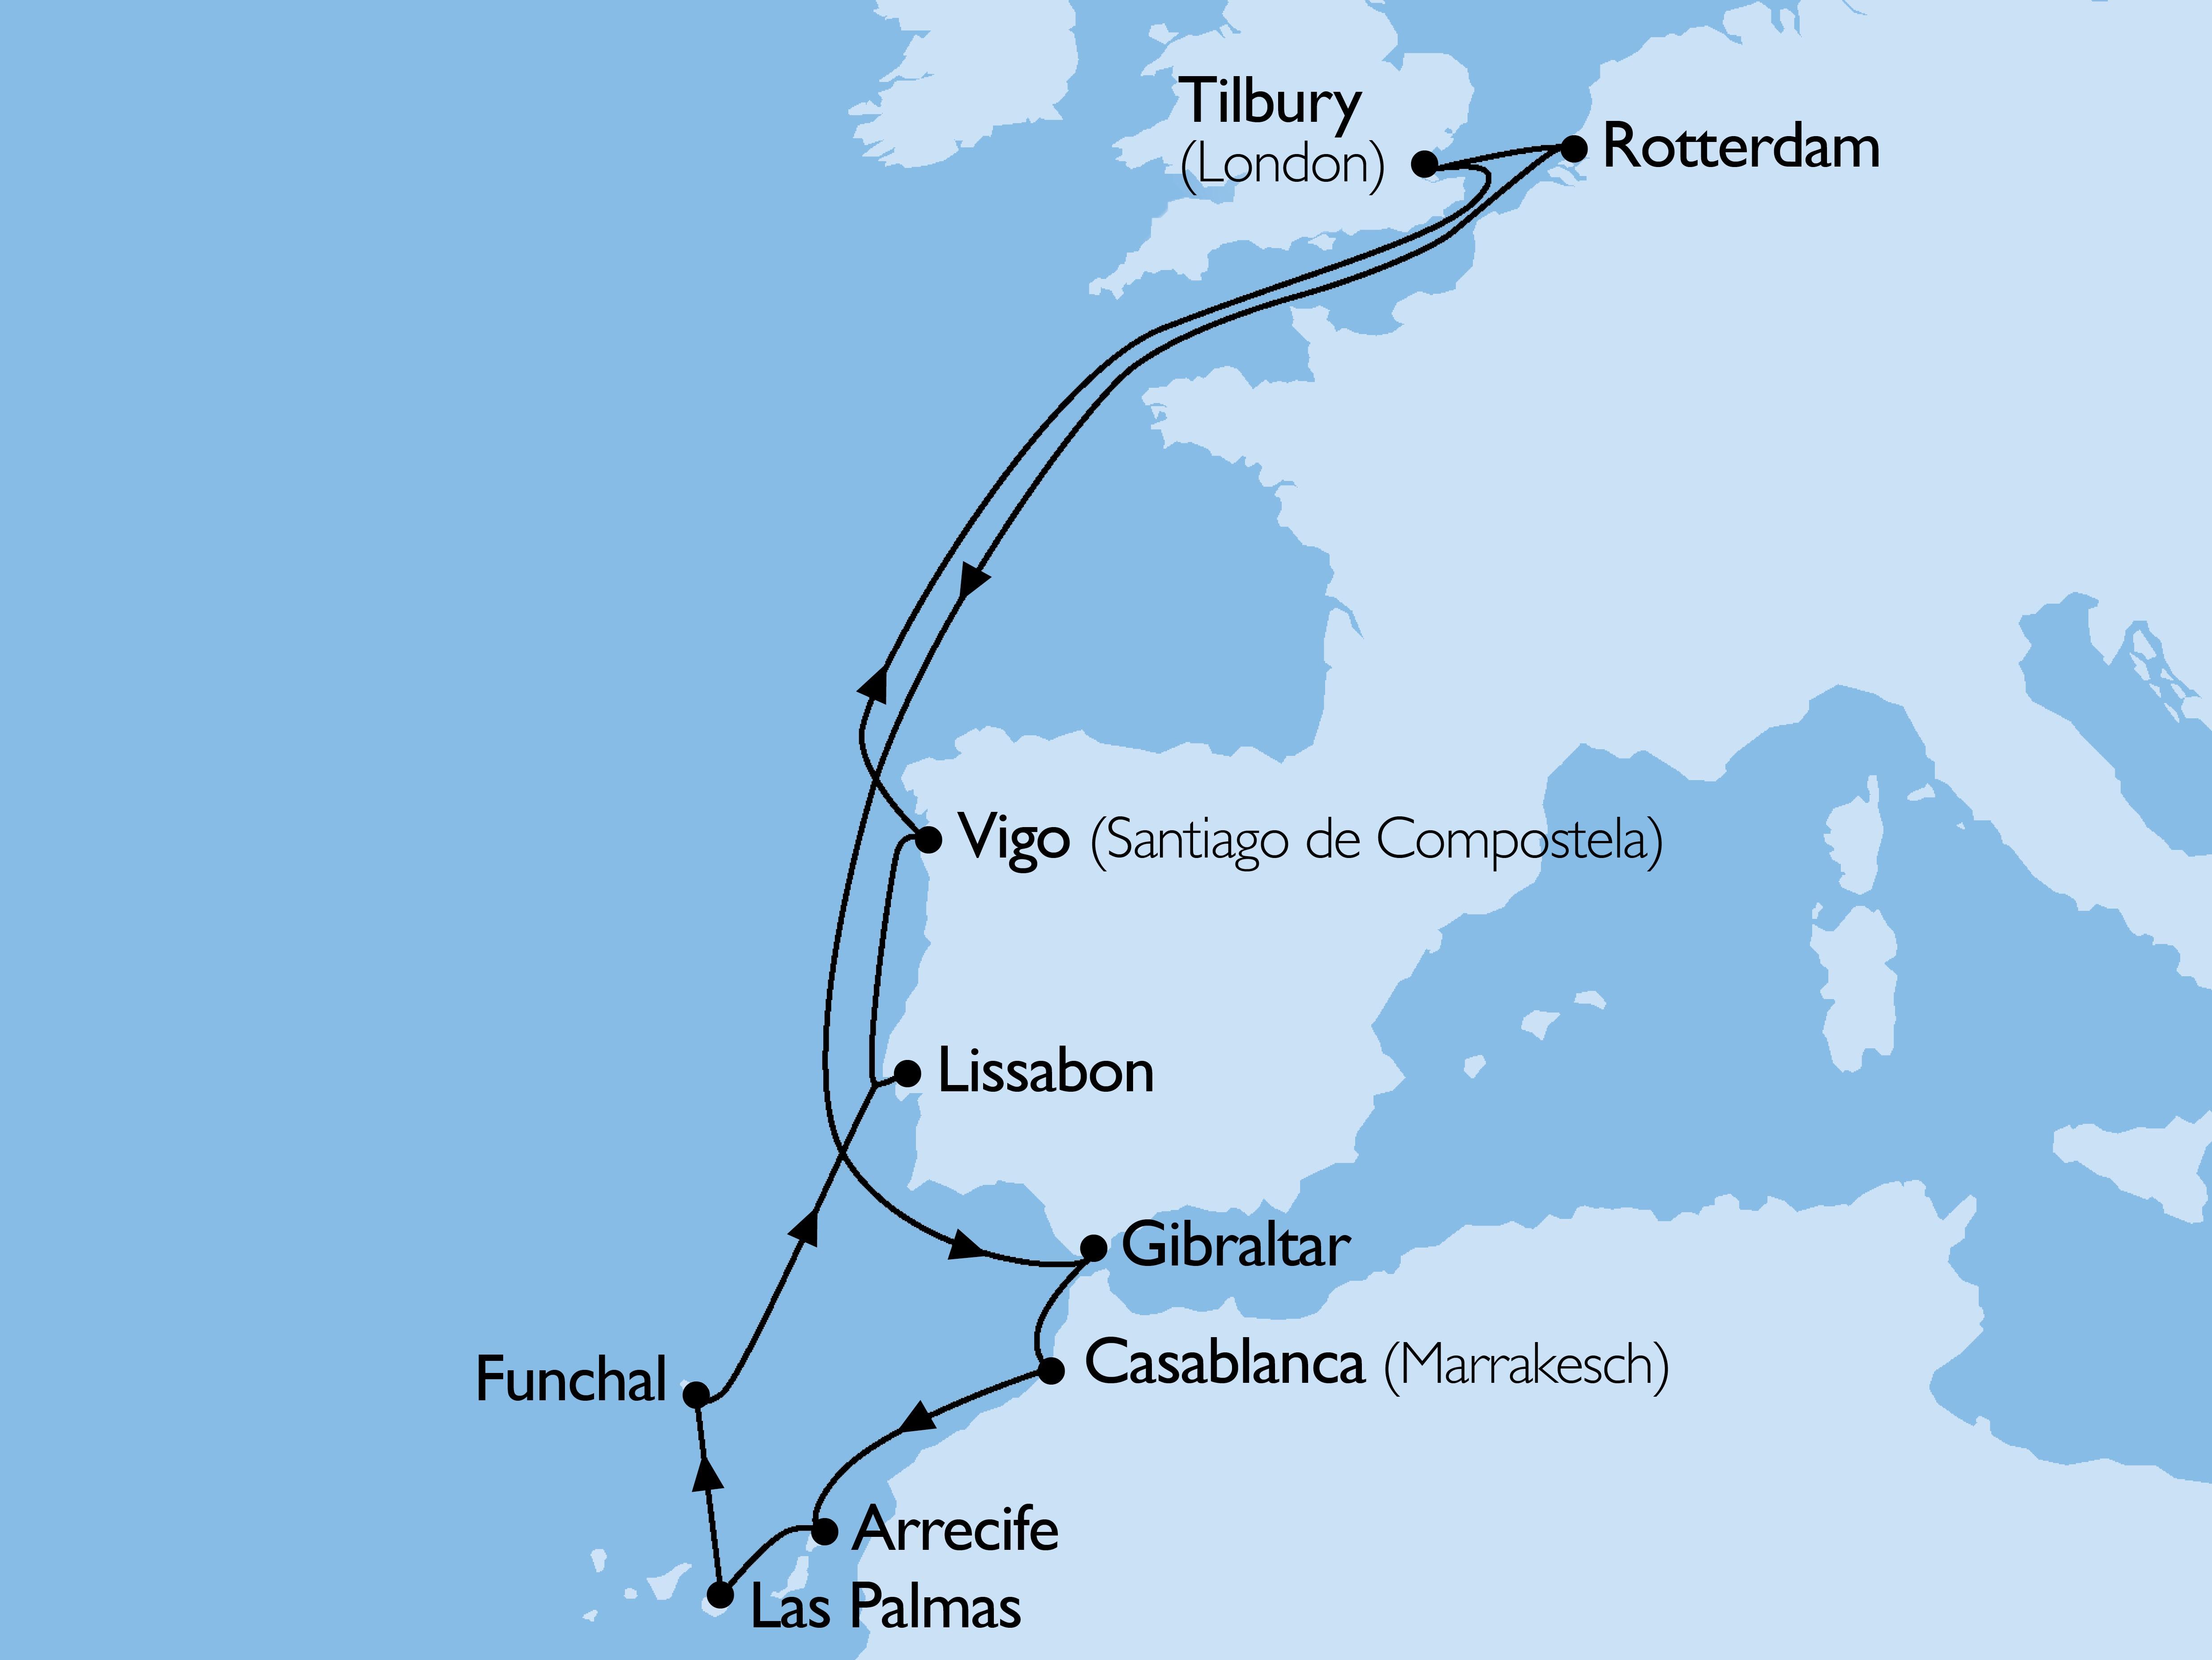 Columbus, Canarische Eilanden, Madeira & Casablanca